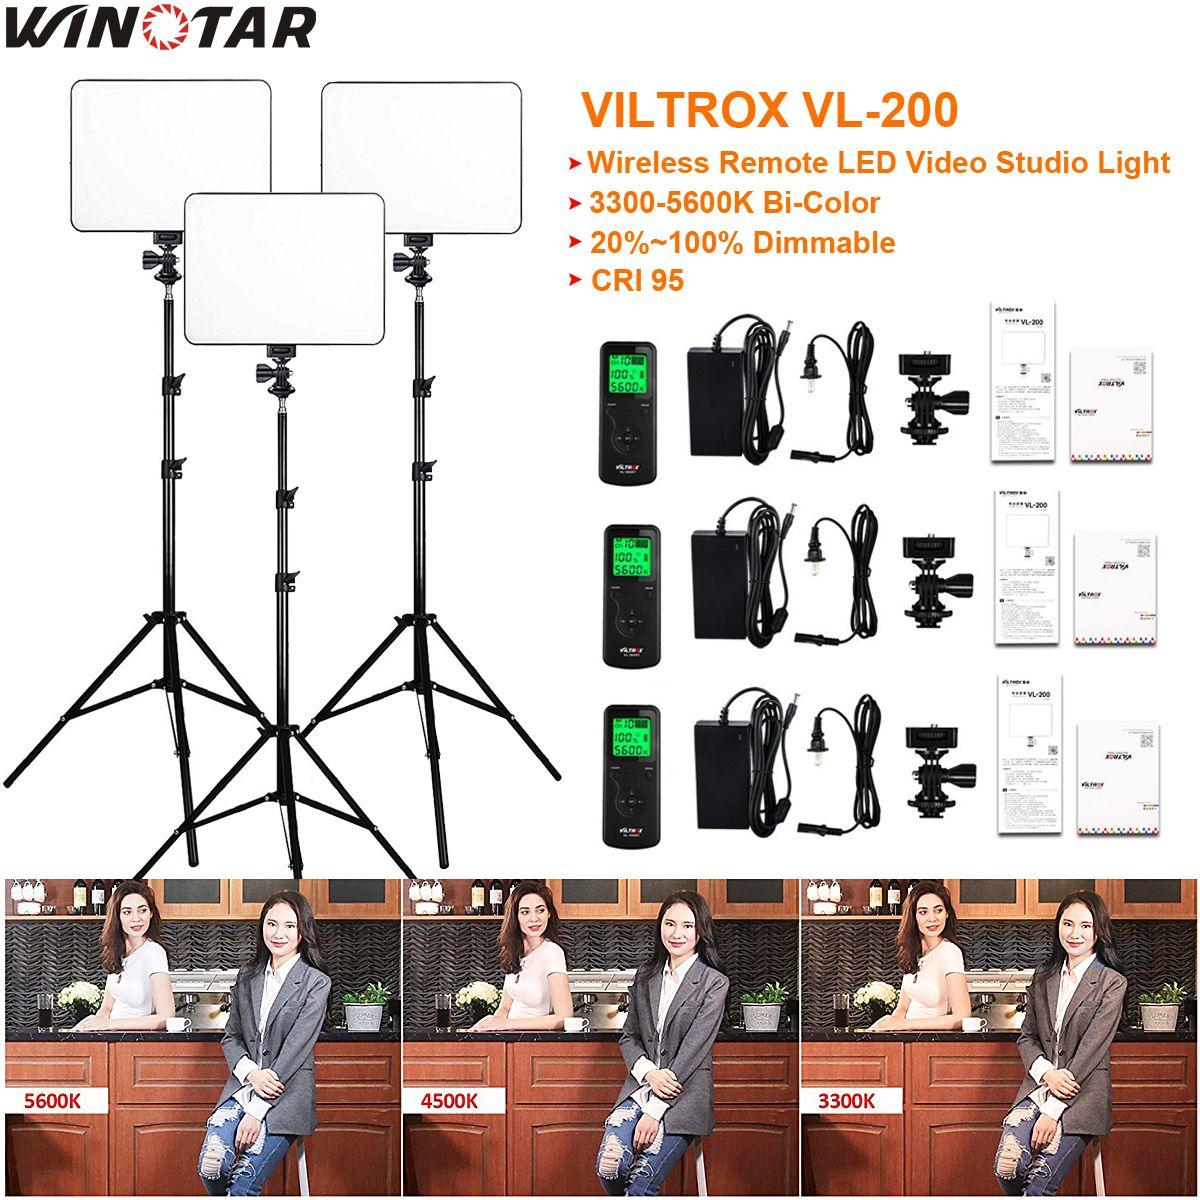 3pcs VILTROX VL-200 3300K-5600K CRI 95 Ultra Thin Dimmable Bi-color LED Video Light Kit + 3x Light Stand + 3x AC adapter